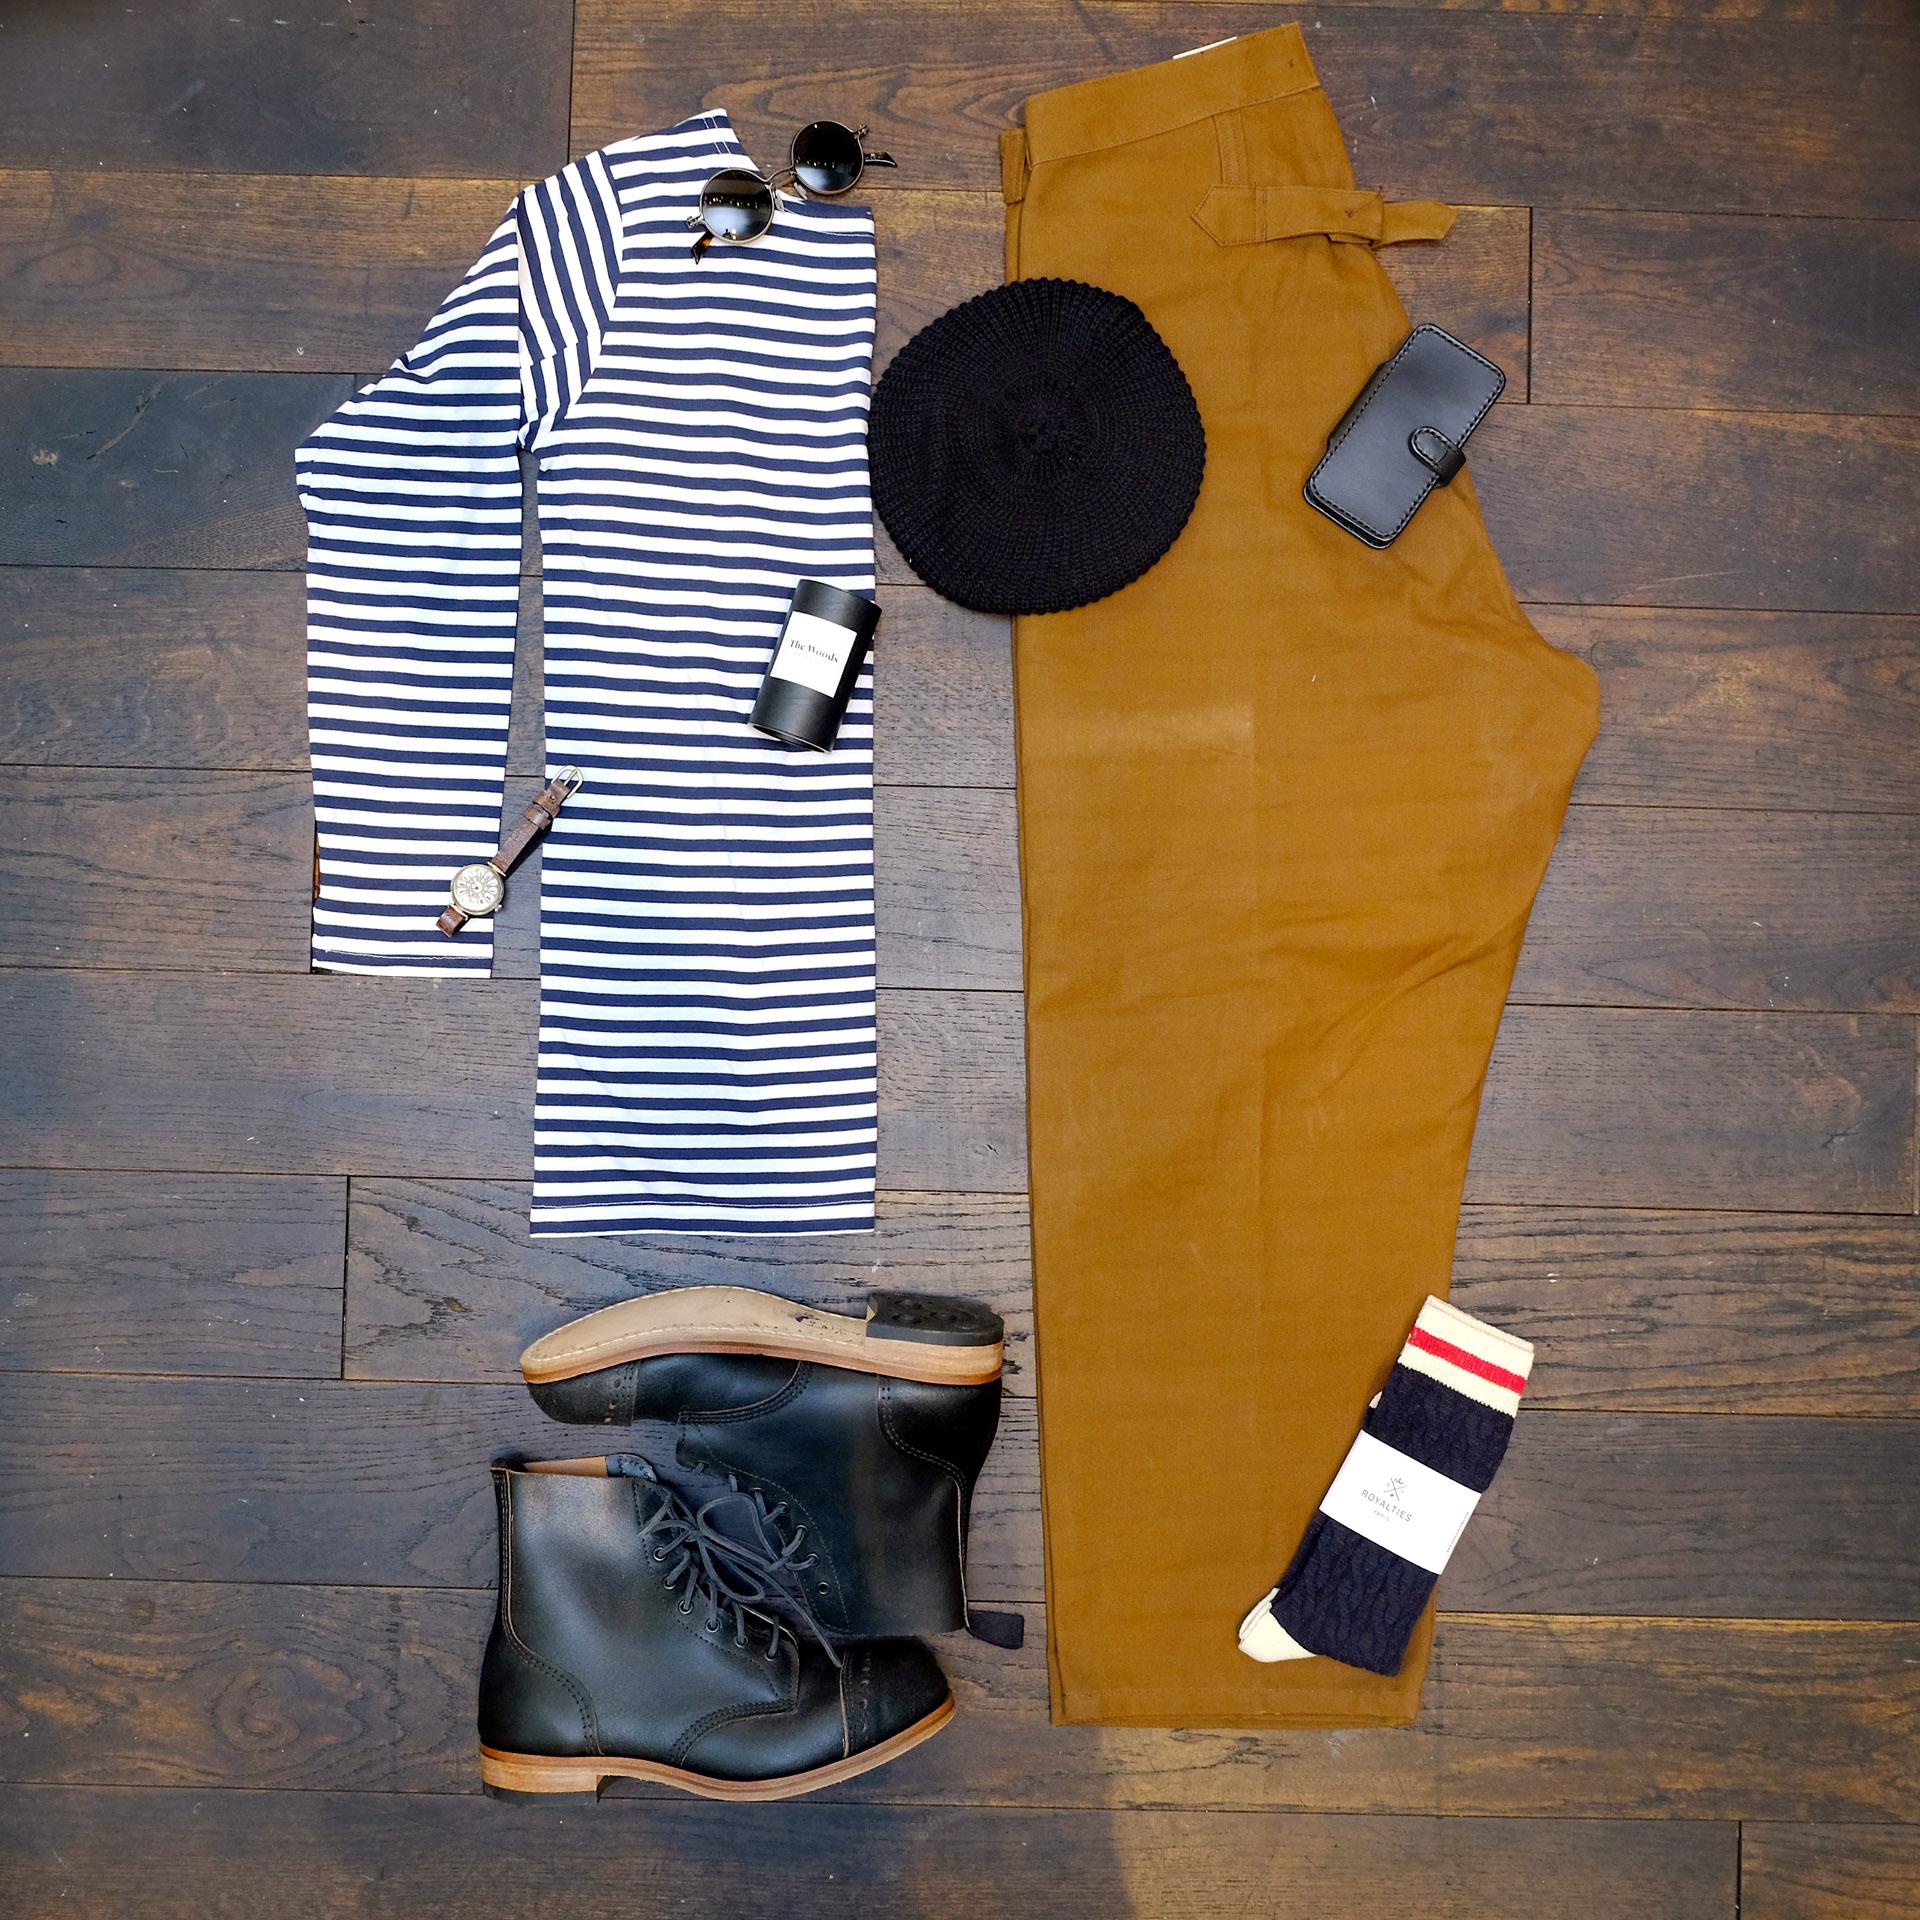 outfit-marineshirt-eisenbahnerhose-interbrigade-derbyboots-blacksign-barett